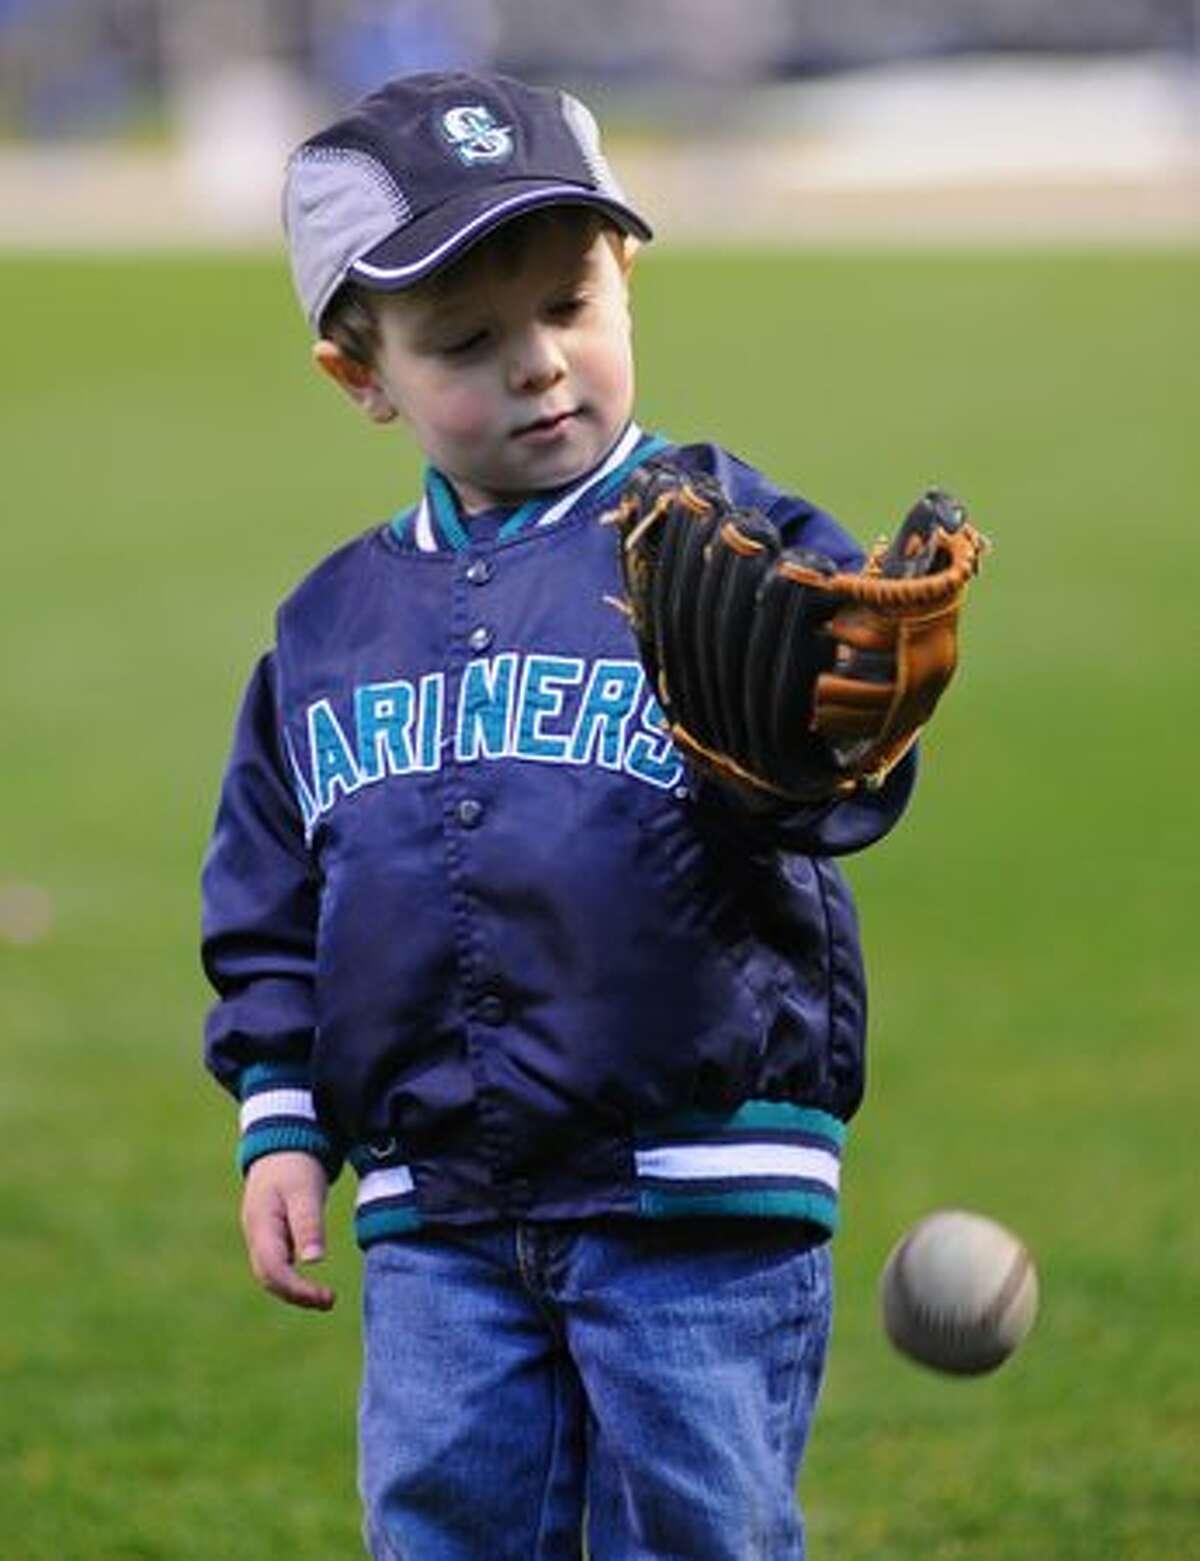 Max Vukelic, 2, plays catch.